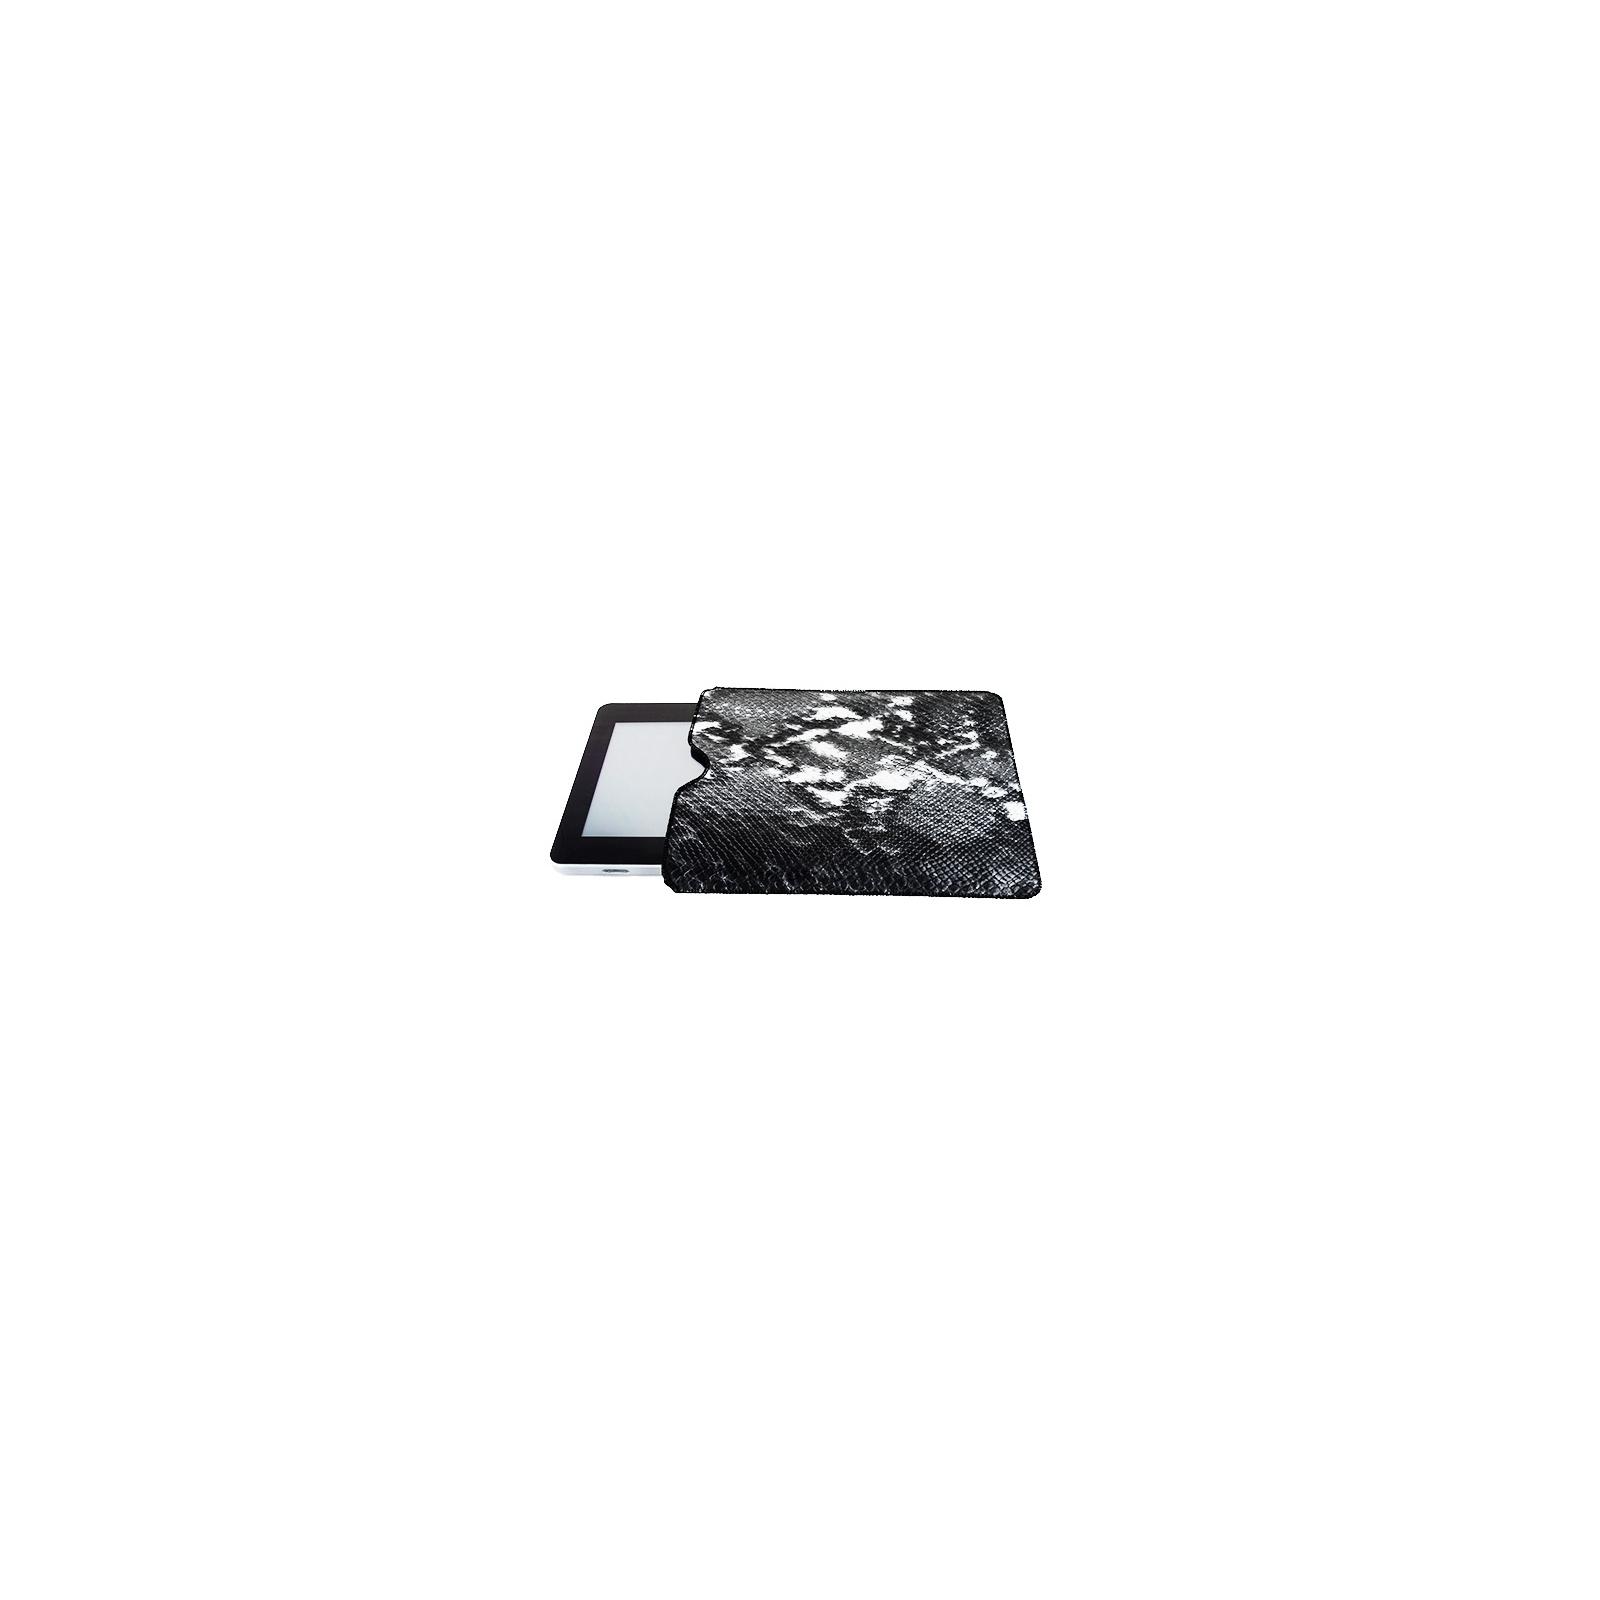 "Чехол для планшета Drobak 9.7-10.1"" Universal/Сrocodile Case /Black (216828) изображение 2"